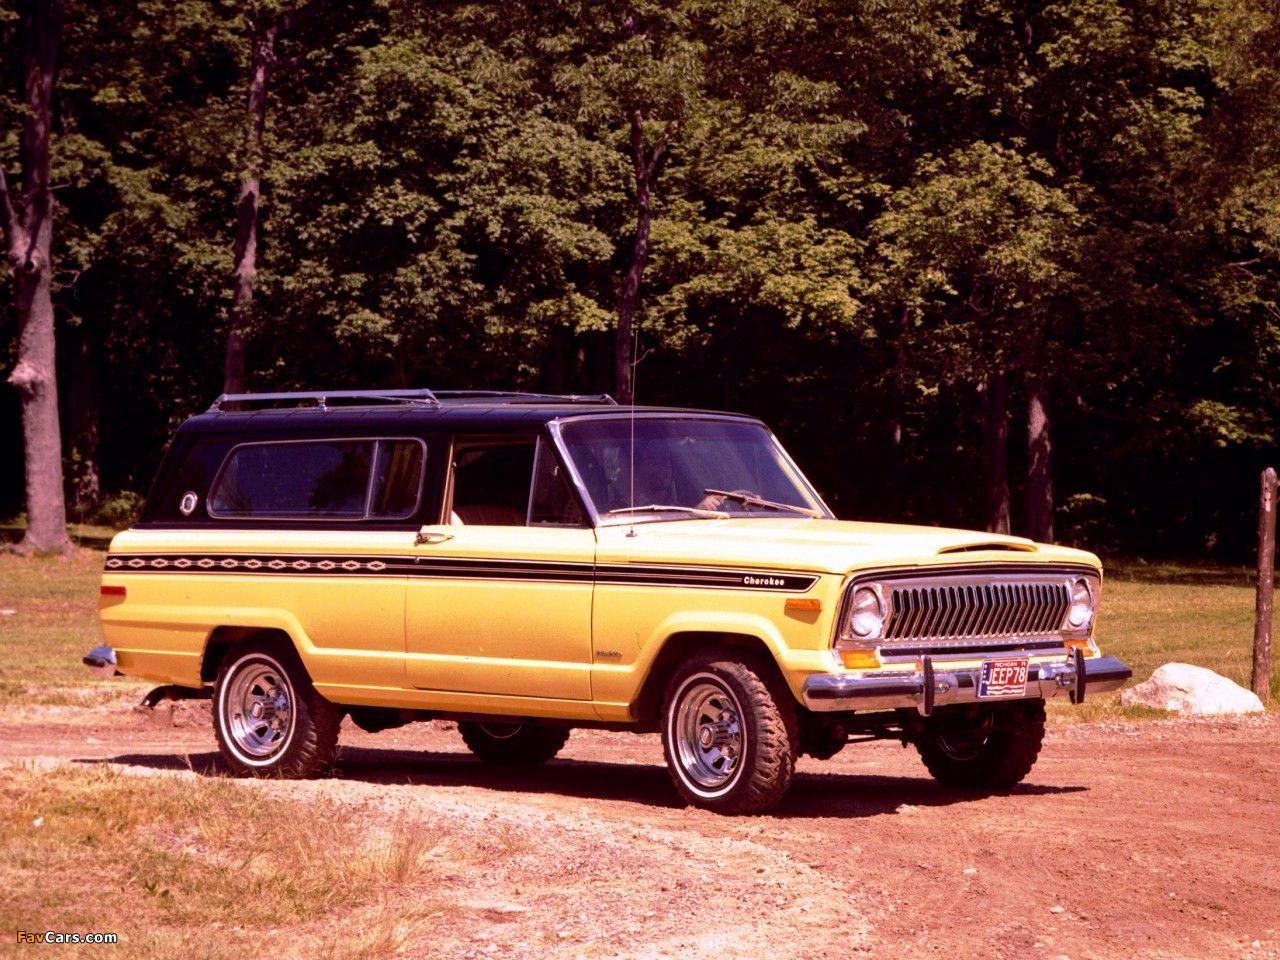 1024x768 Car Wallpapers Jeep Cherokee Sj 1974 78 Wallpapers 1280x960